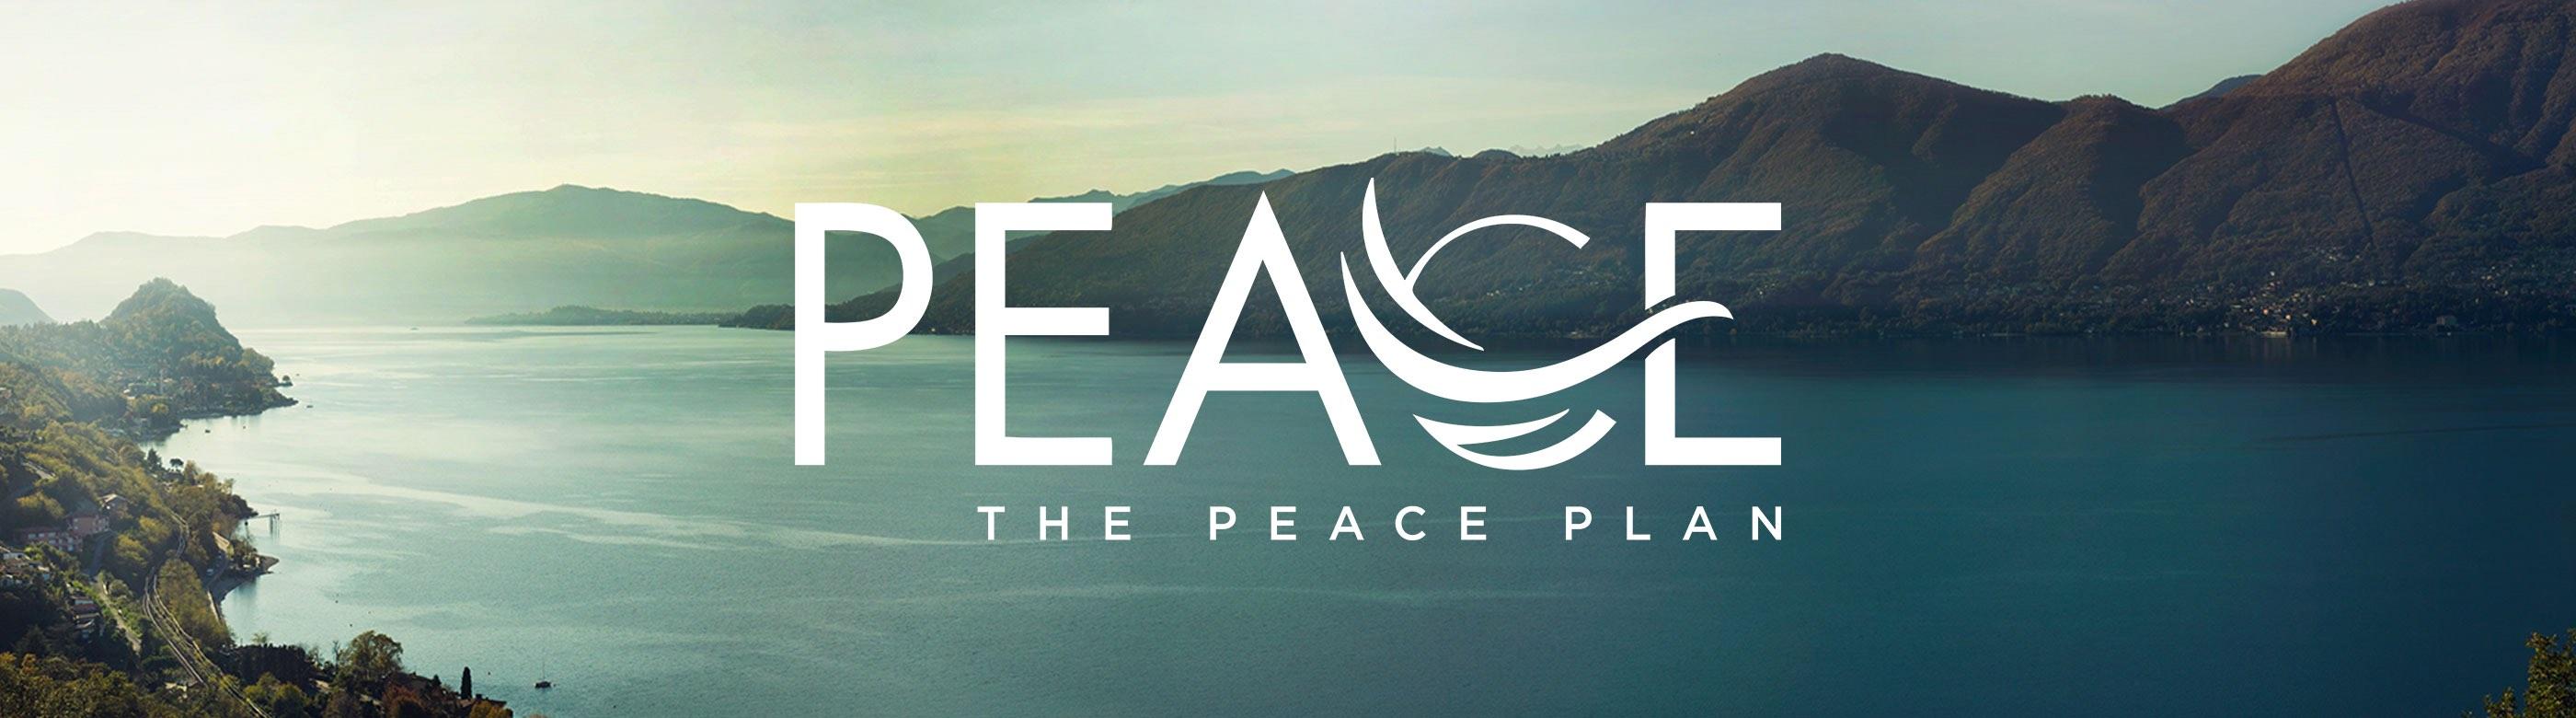 The Peace Plan